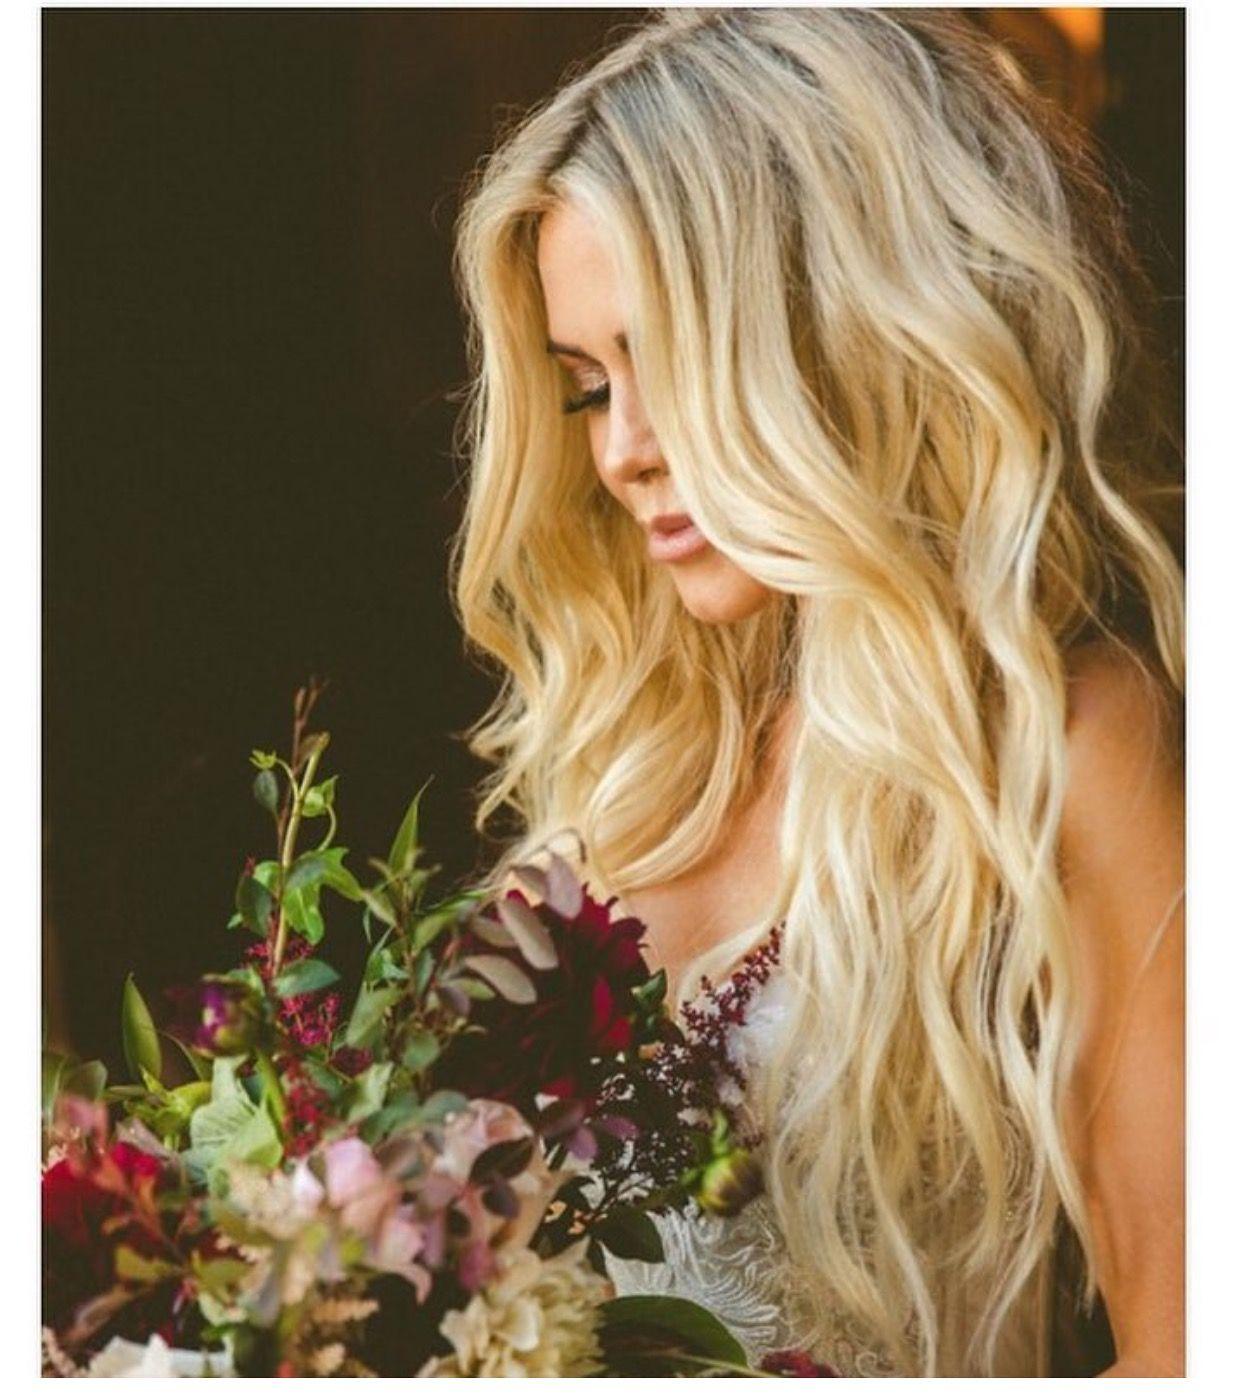 pinterest: msheatherette26 | blond hair in 2019 | wedding